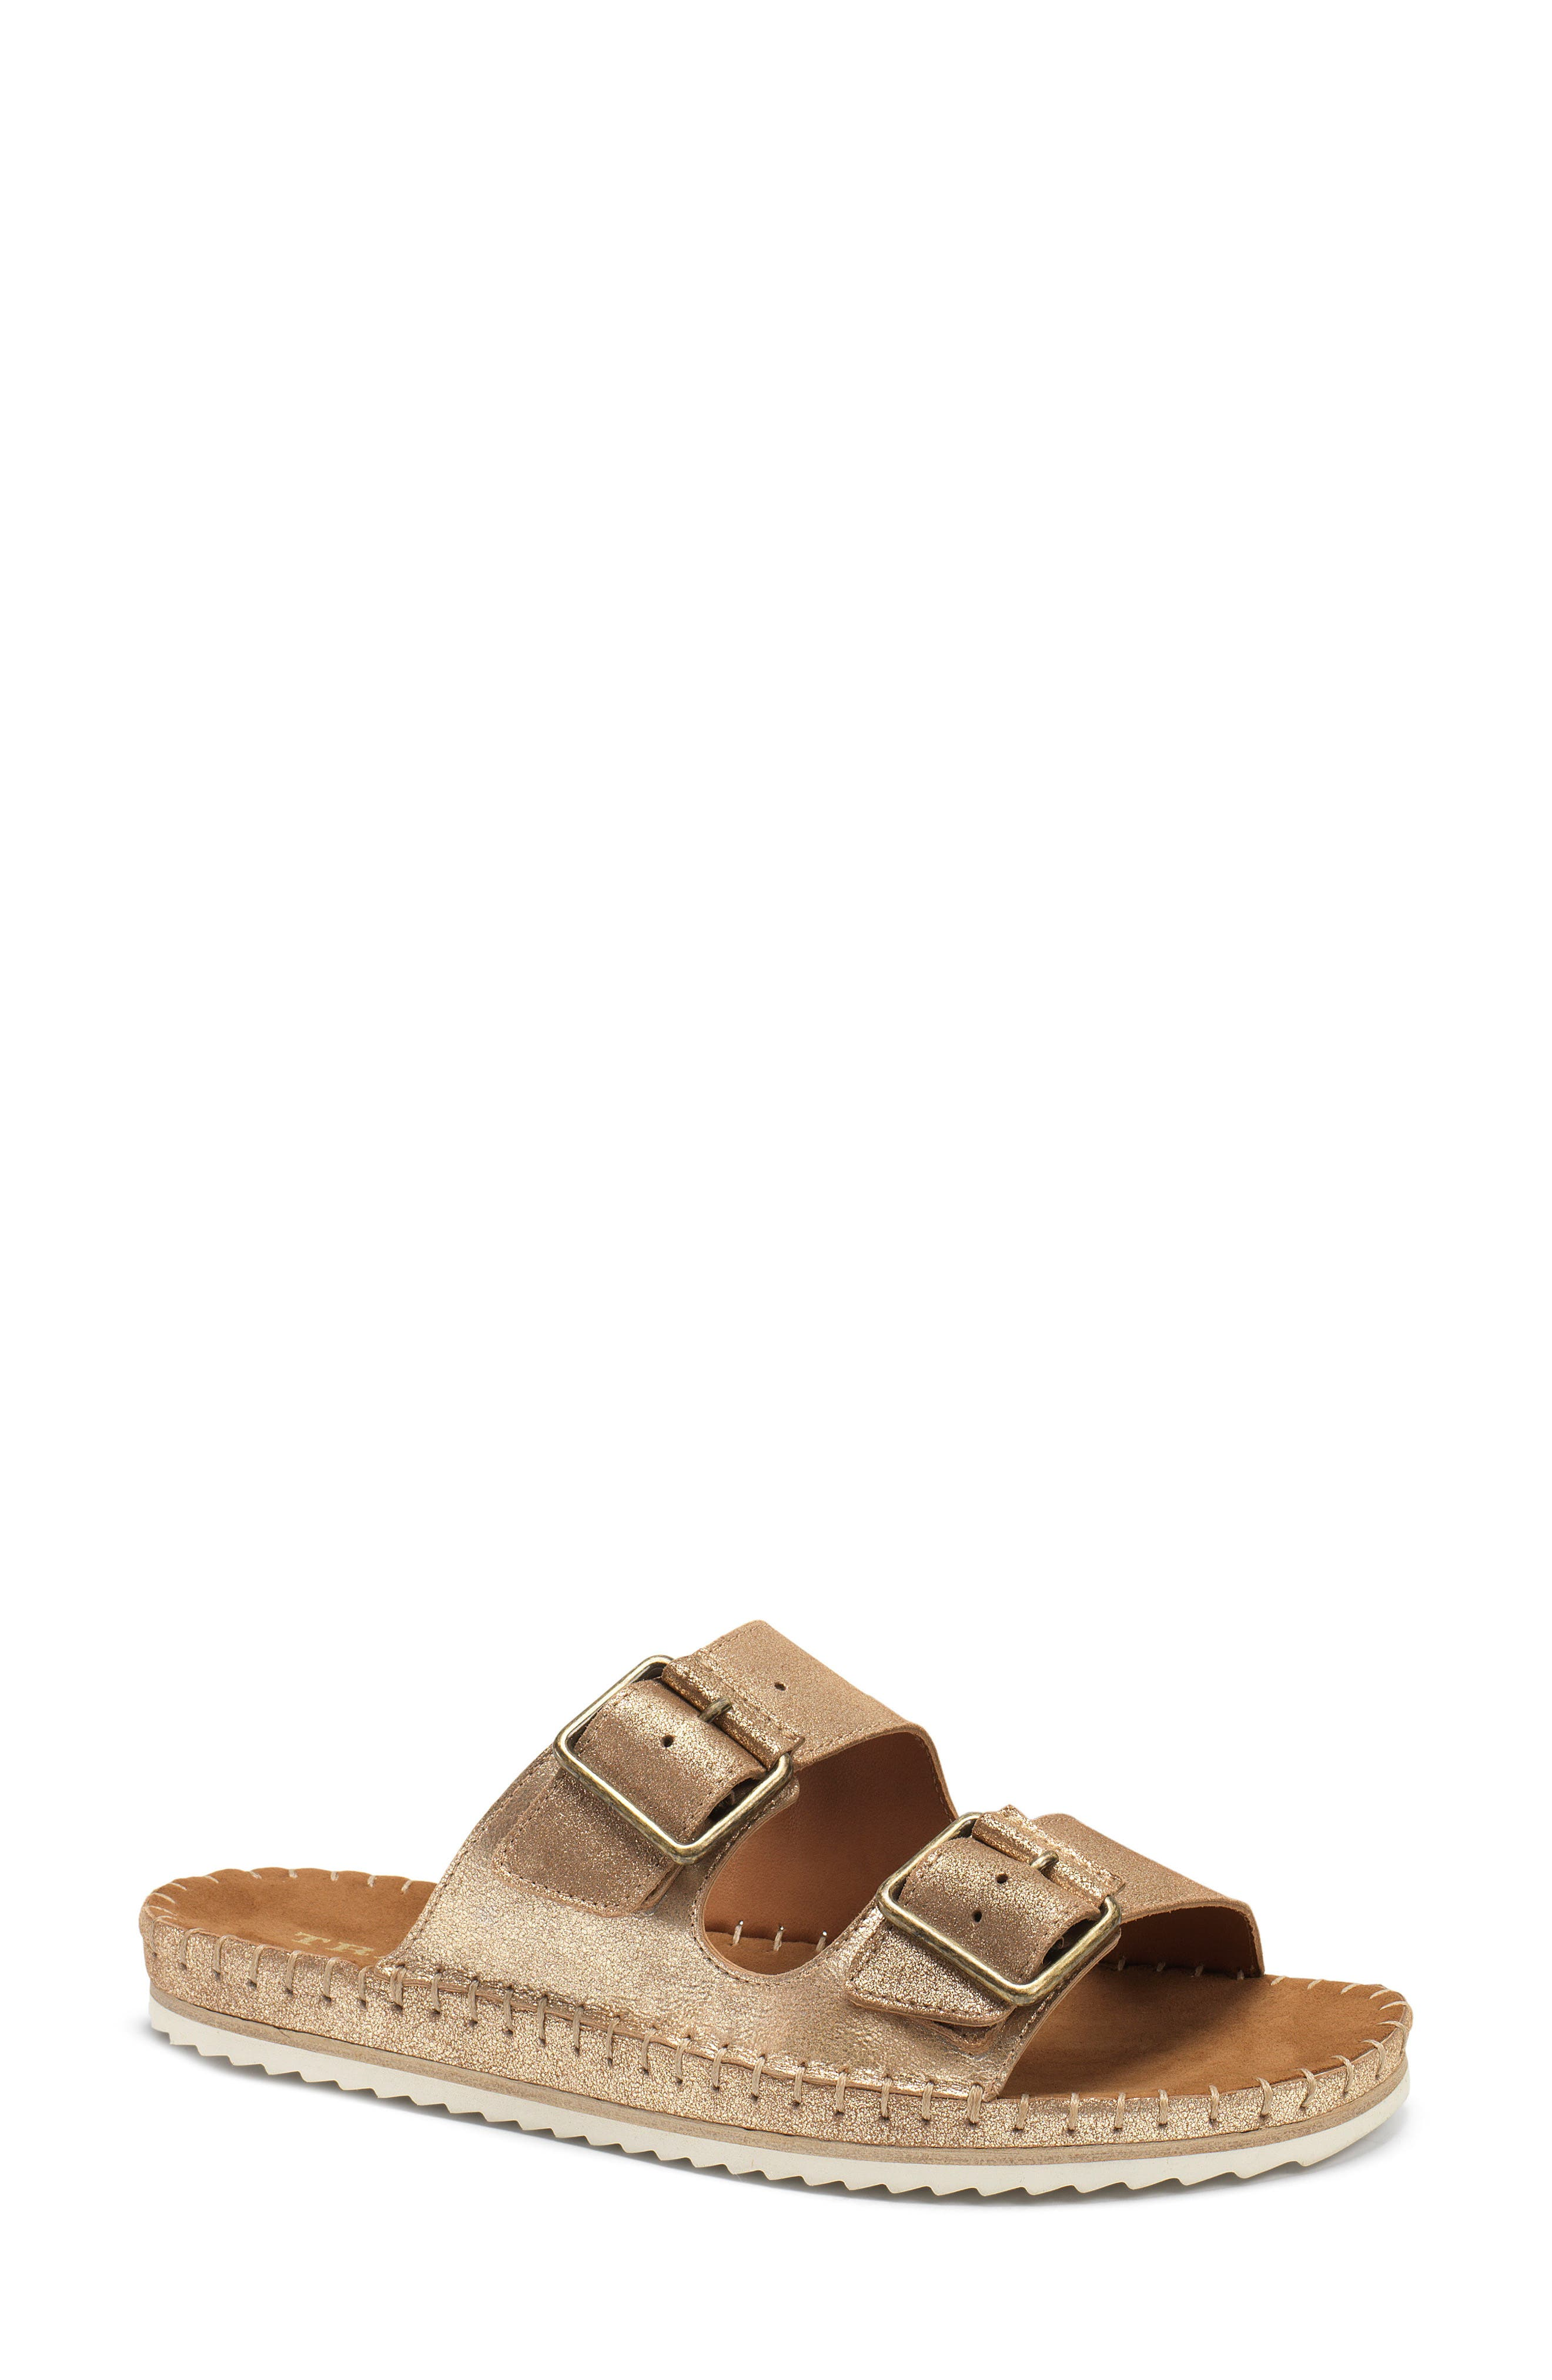 Carli Slide Sandal,                         Main,                         color, GOLD METALLIC SUEDE